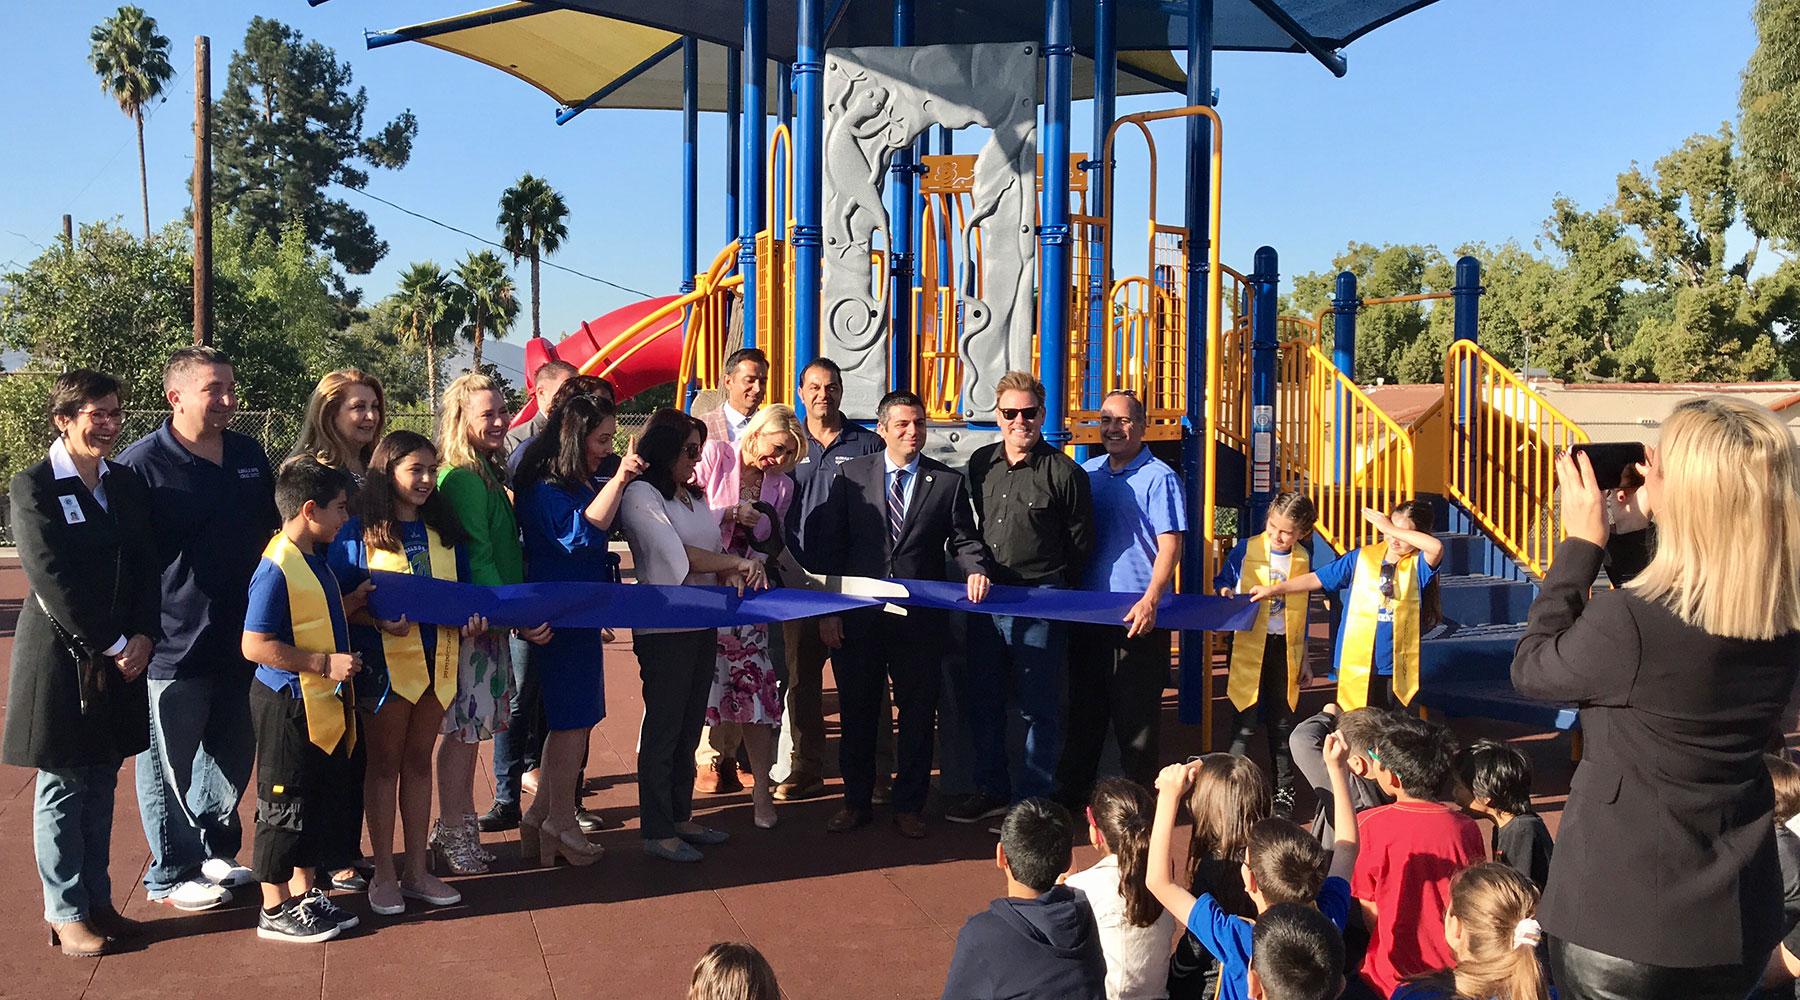 Balboa Elementary School Playground Ribbon Cutting Ceremony